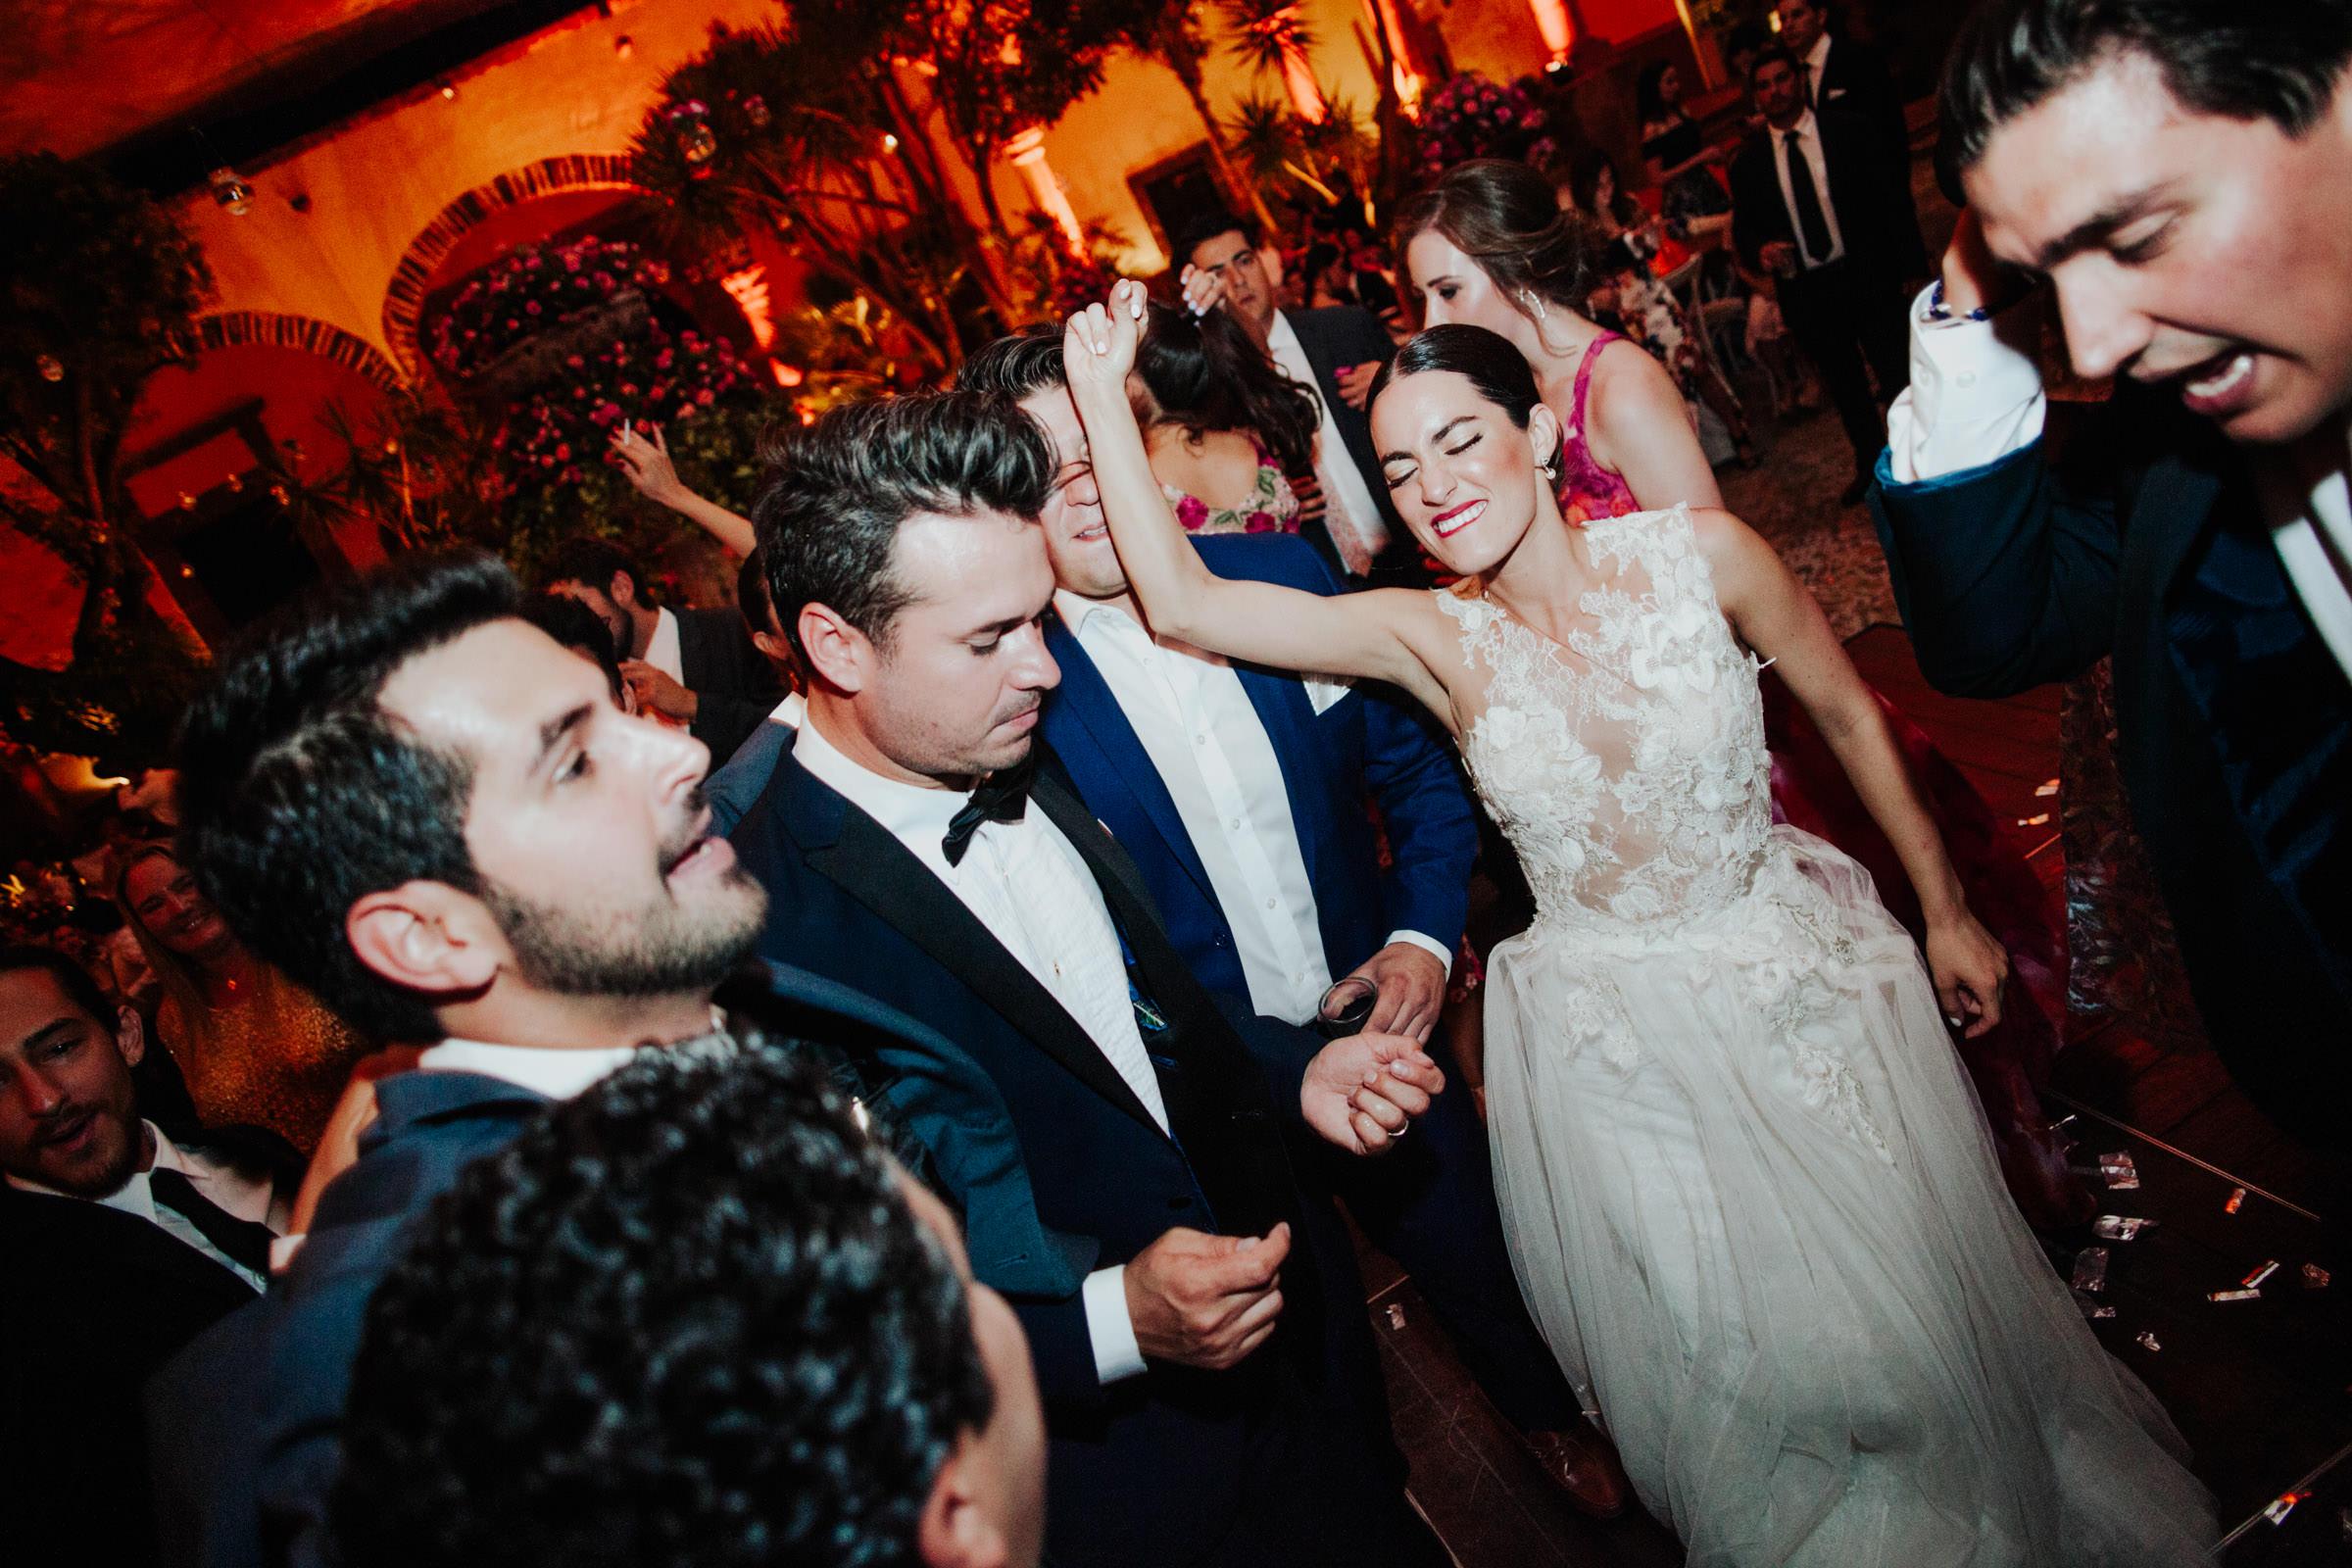 San-Miguel-de-Allende-Wedding-Photography-Parroquia-Instituto-Boda-Fotografia-Fer-Sergio-Pierce-Lifestyle-Photography0072.JPG